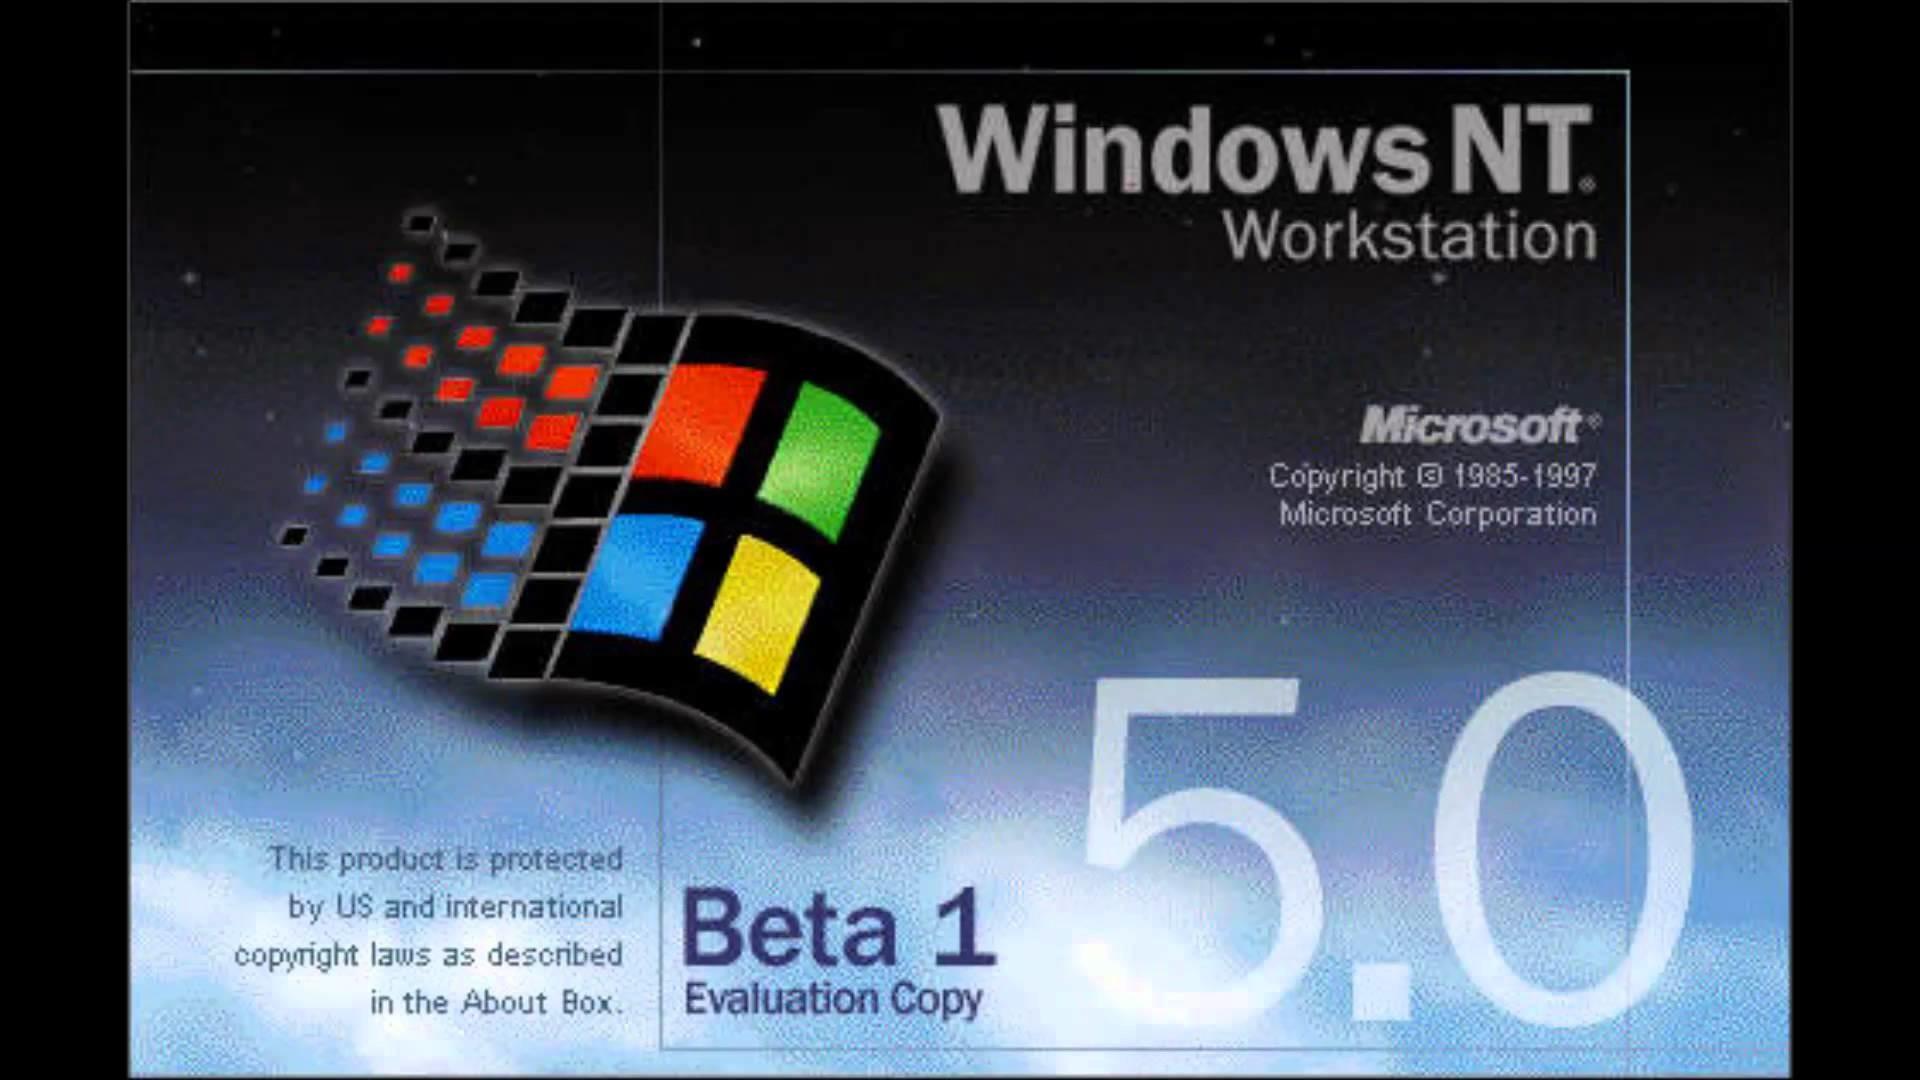 Windows Nt 40 Wallpaper (73+ images)